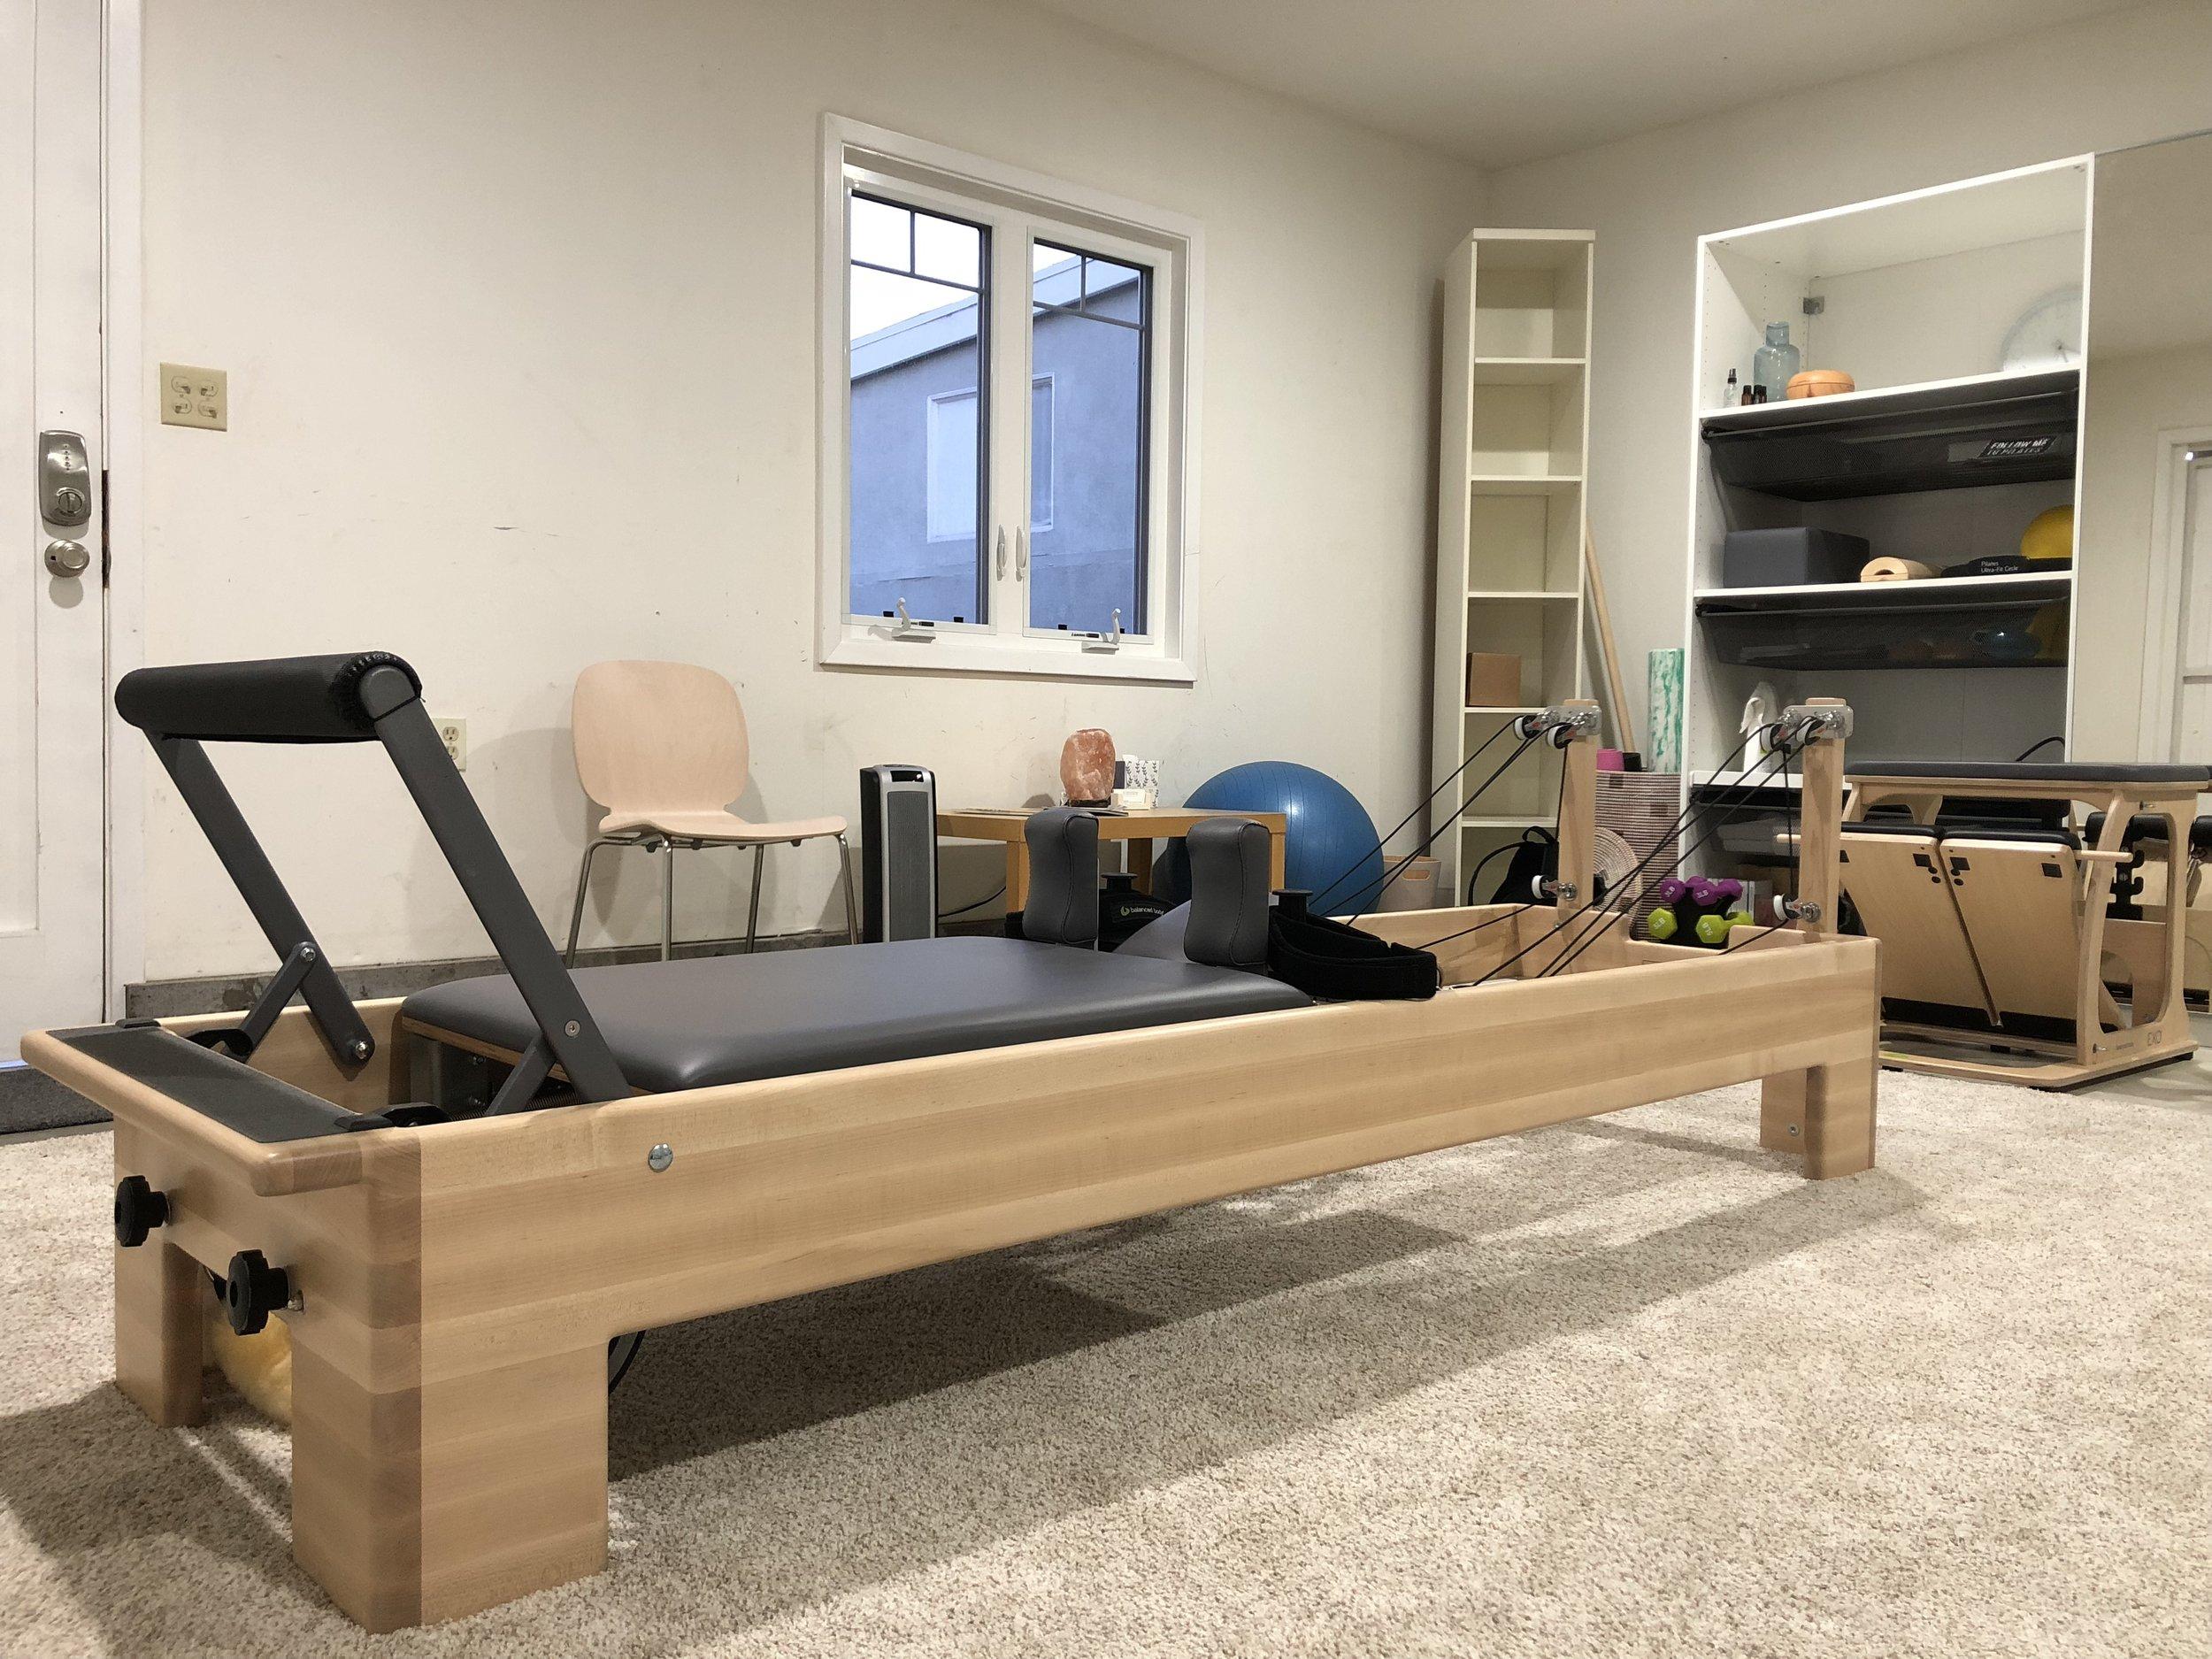 Pilates_Reformer_El Segundo_Pilates Studio_Rehab.jpg